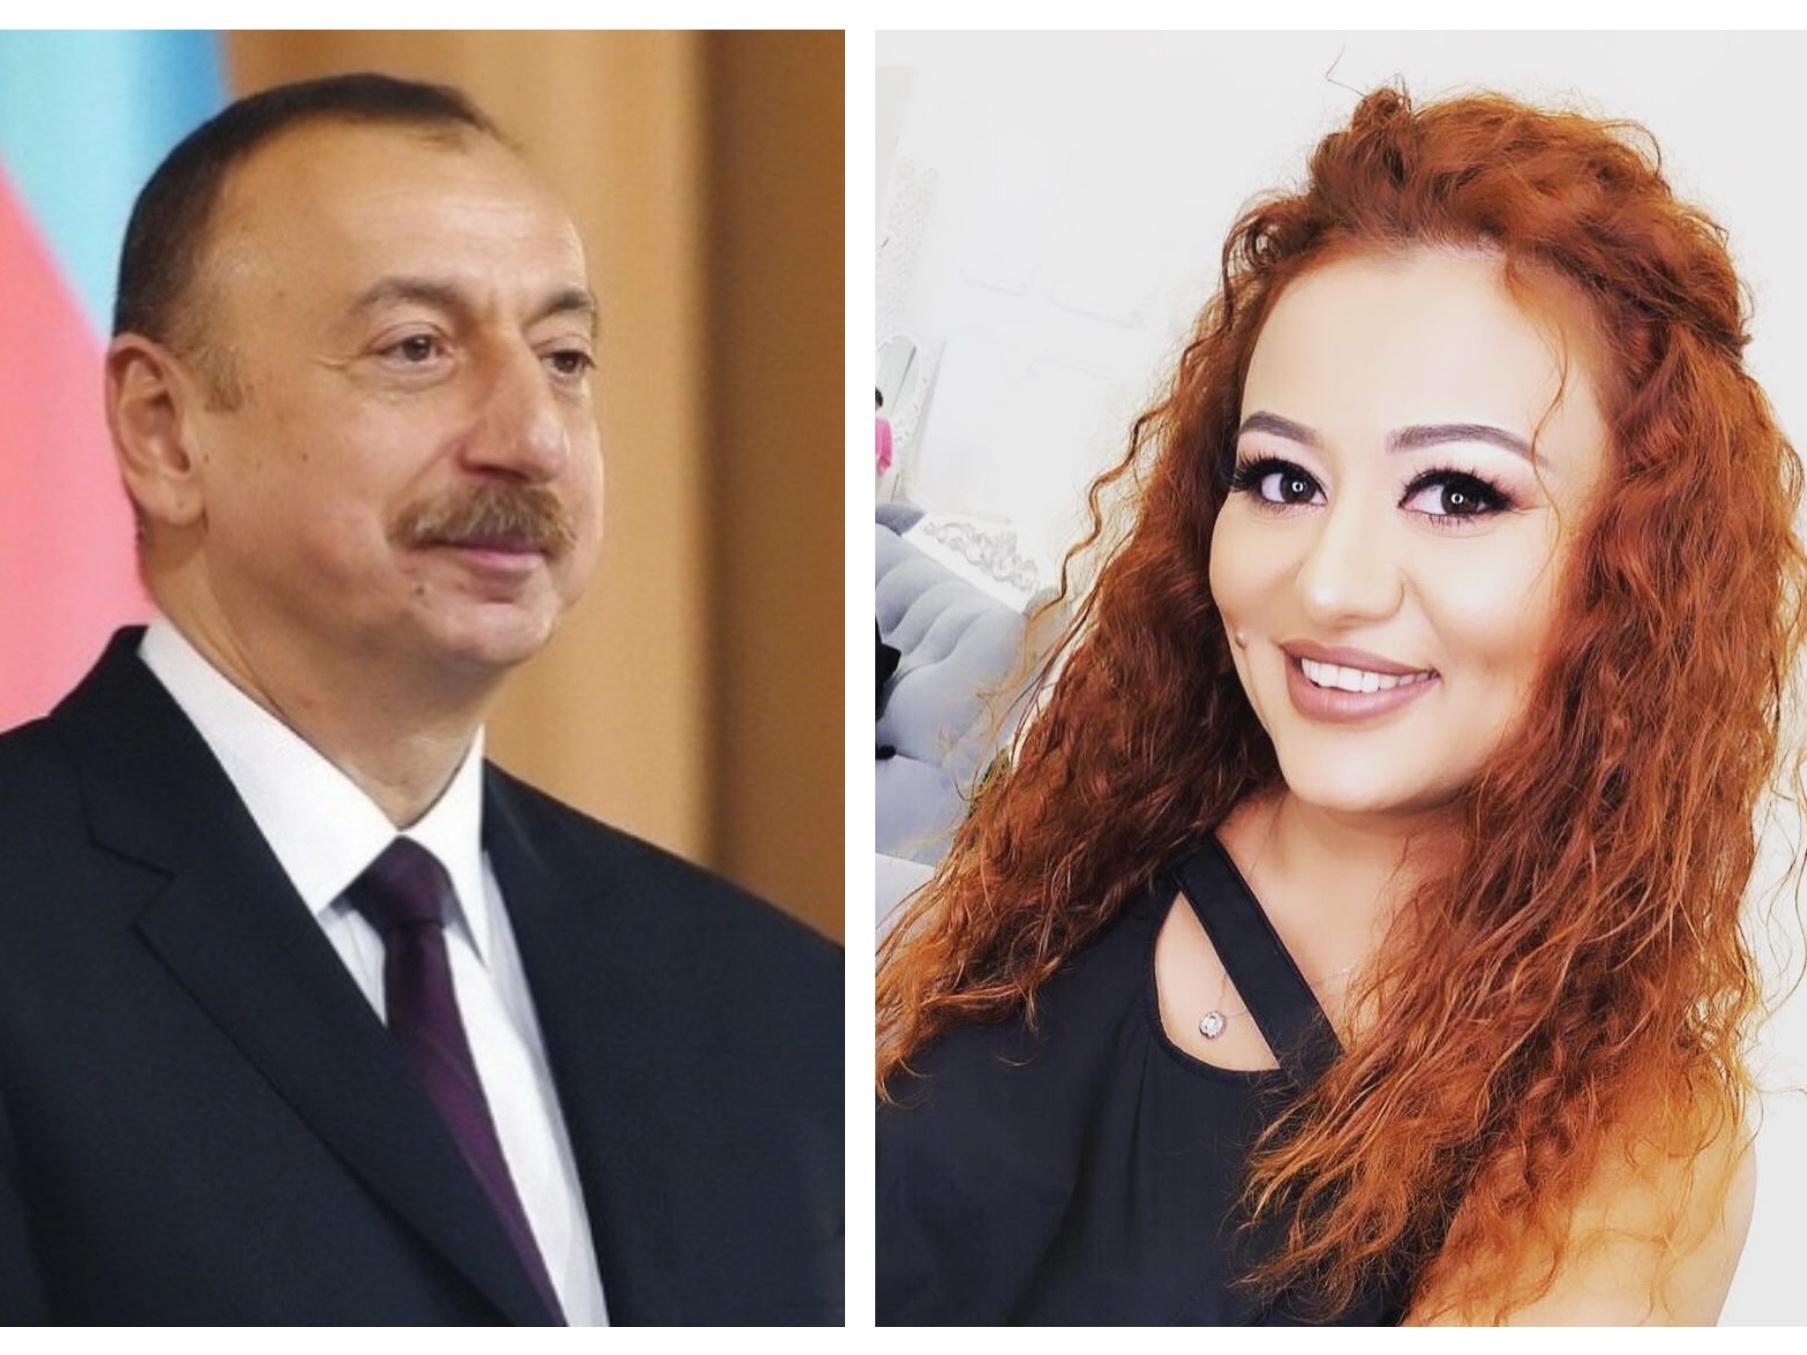 Президент Азербайджана Ильхам Алиев подарил квартиру актрисе Вафе Зейналовой